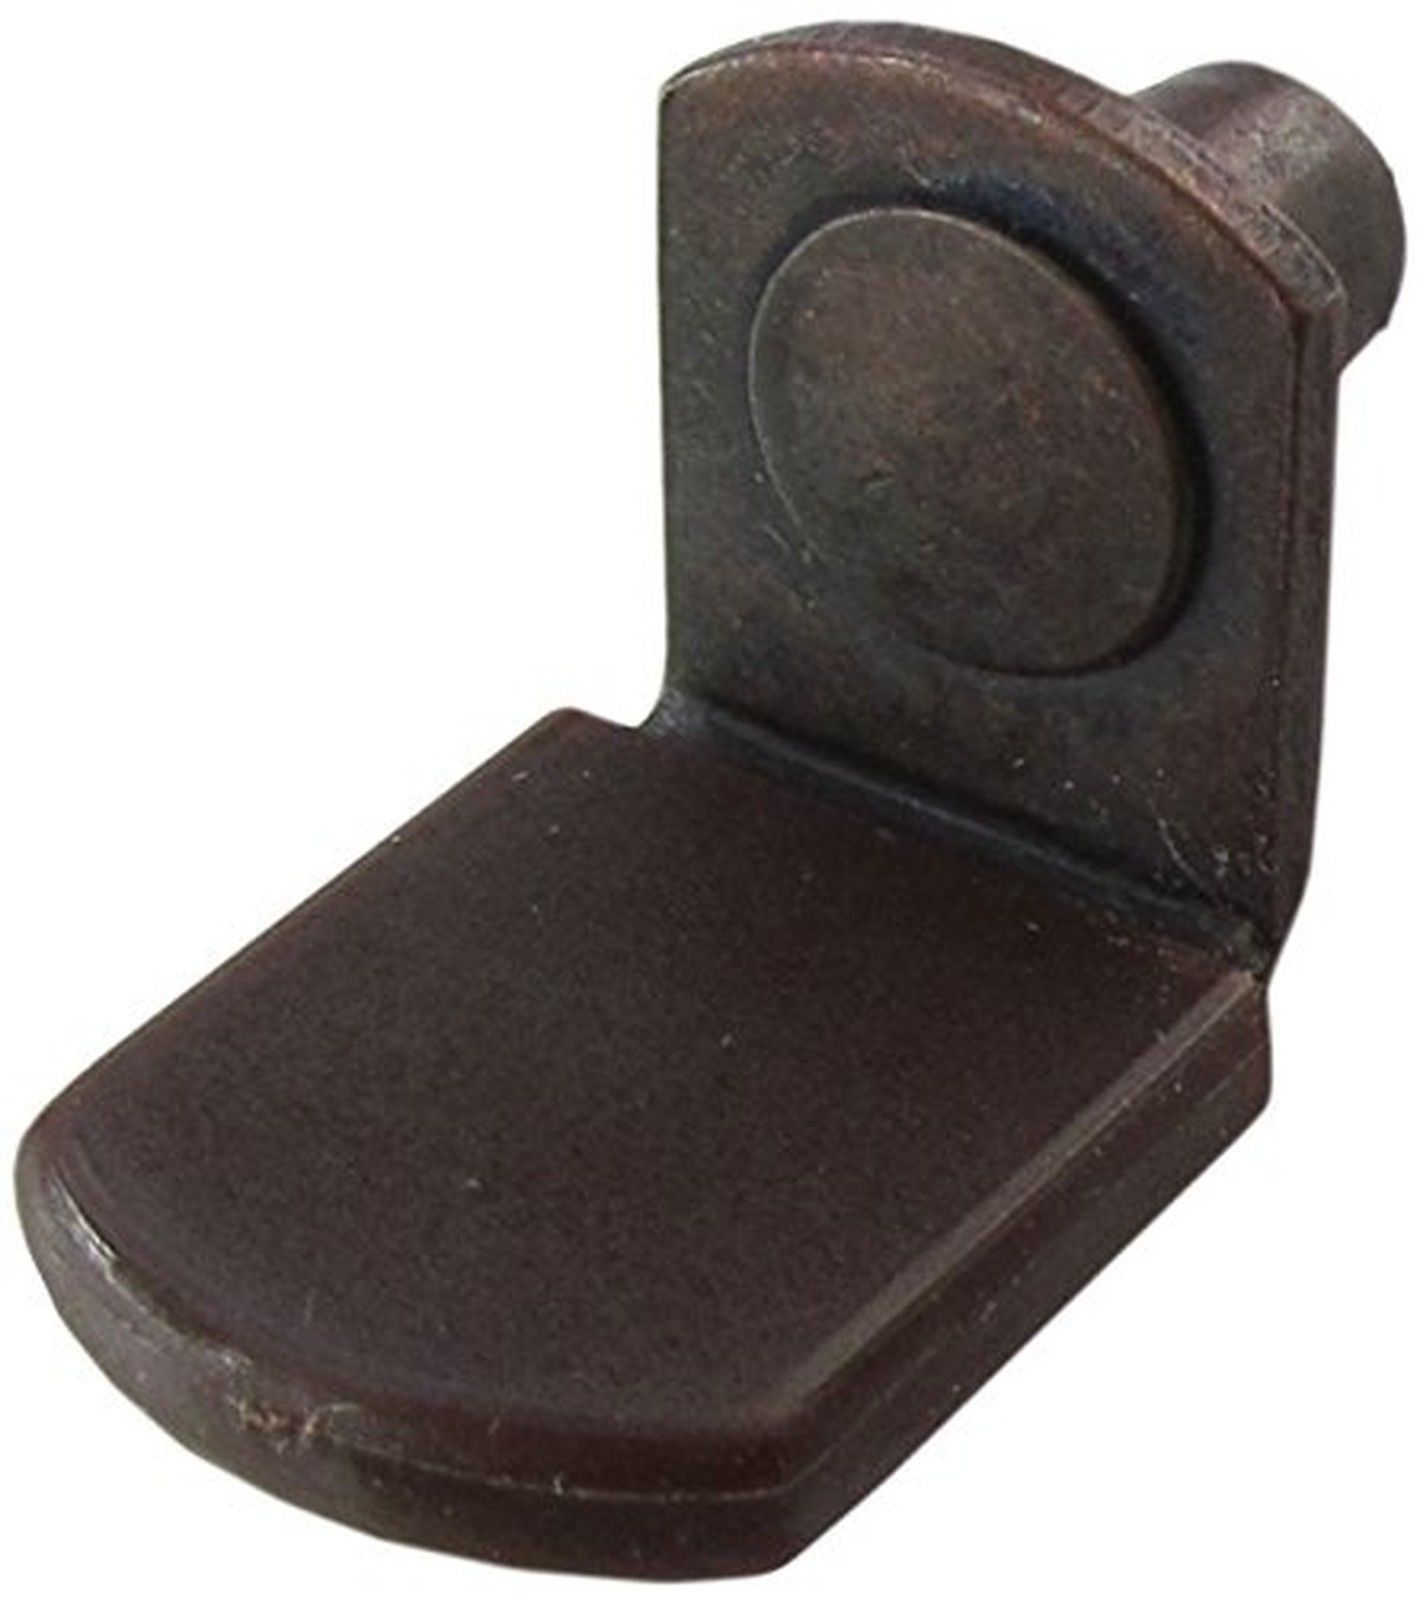 1 4 glass shelf support pegs w brown vinyl sleeve bracket